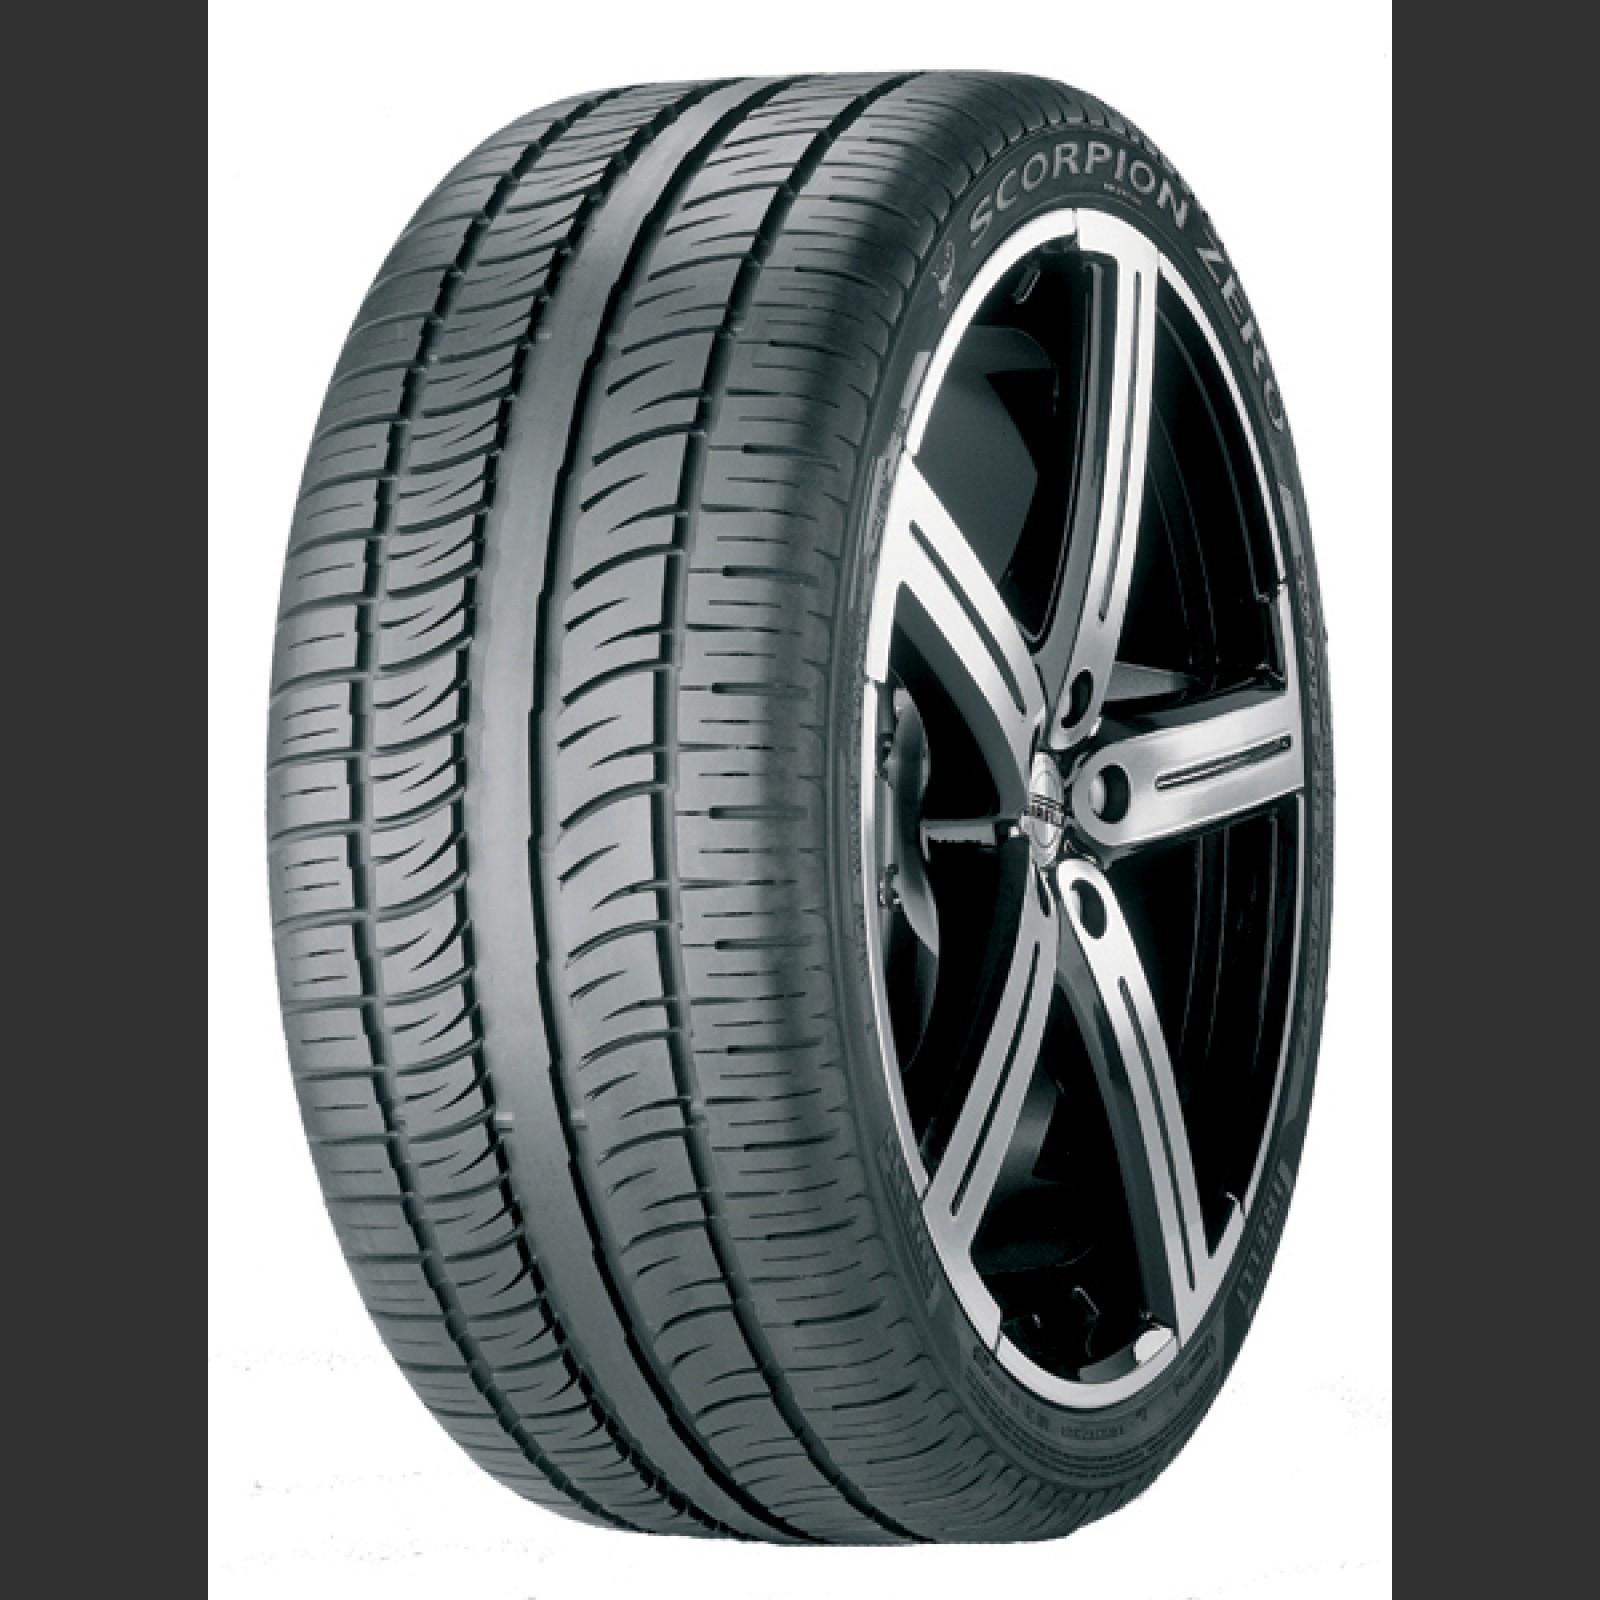 Pirelli 275/50R20 113W, Pirelli, Scorp. ZERO ASIM. (MO1) Osobní a SUV Letní BB69